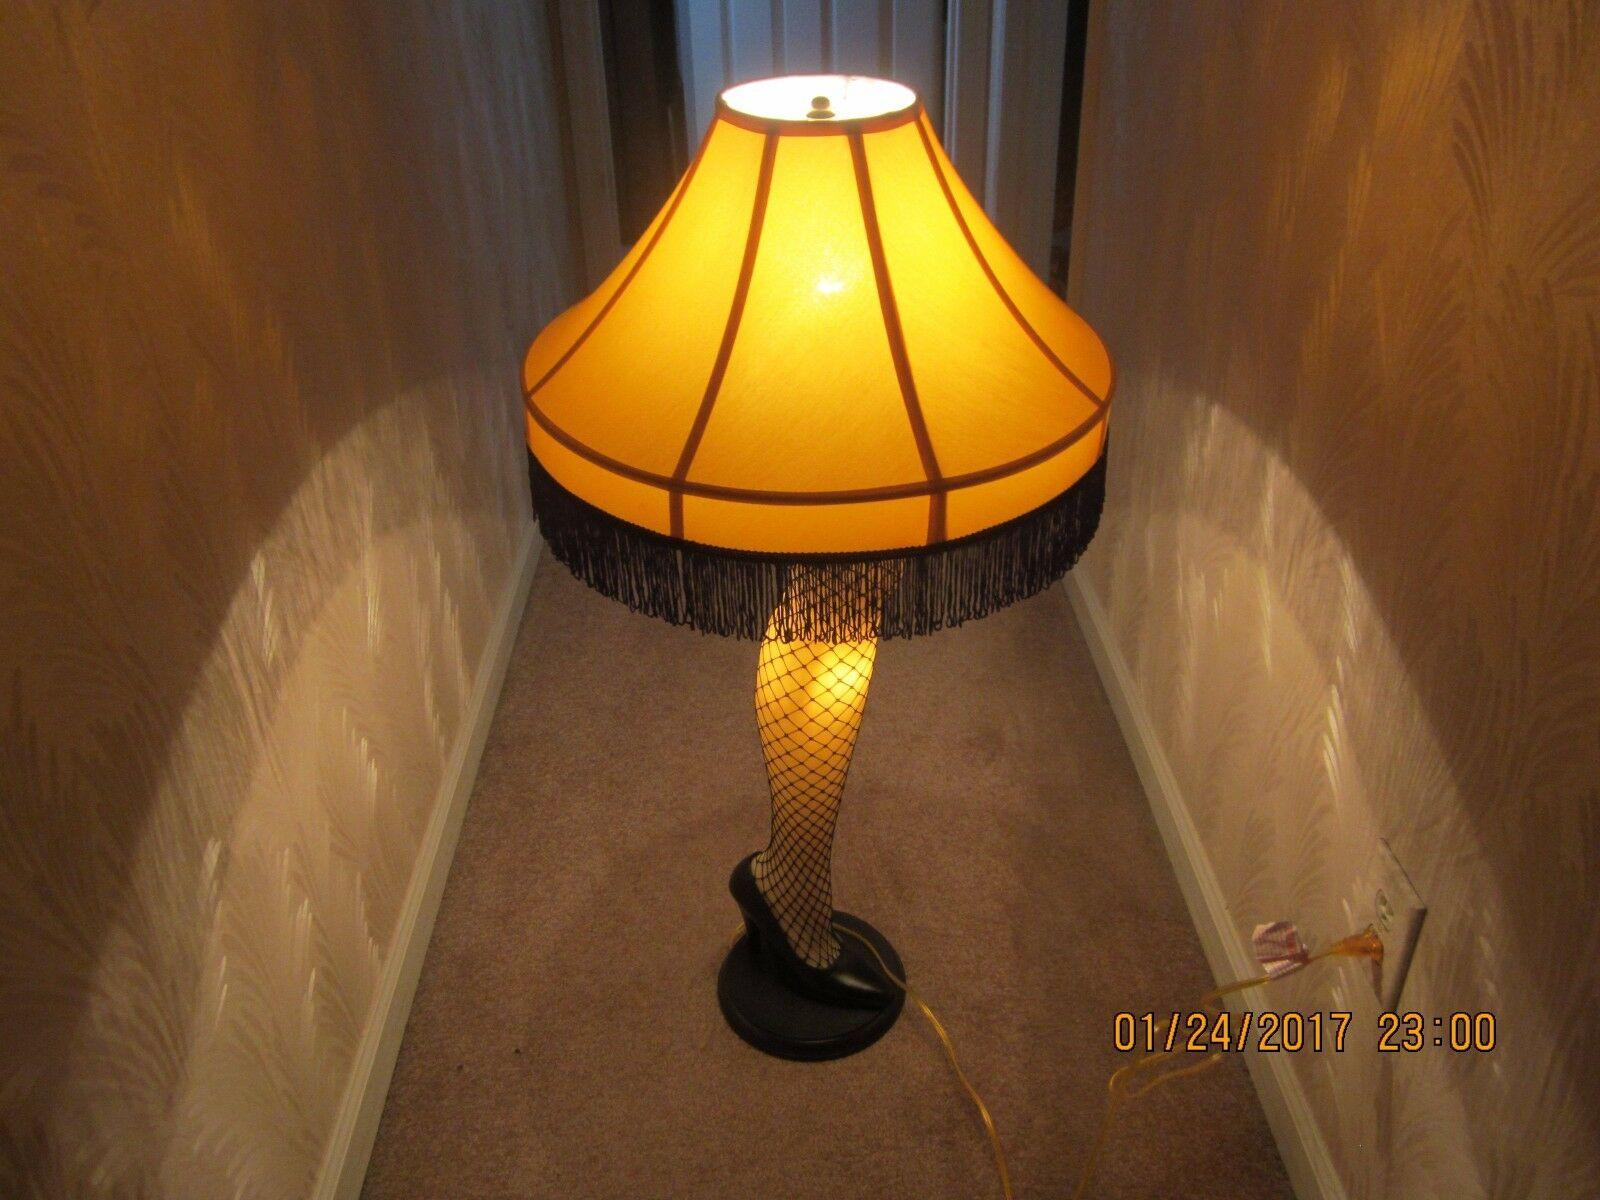 Christmas Leg Lamp Full Size  A CHRISTMAS STORY Full Size 40 Inch Leg Lamp Prop Replica